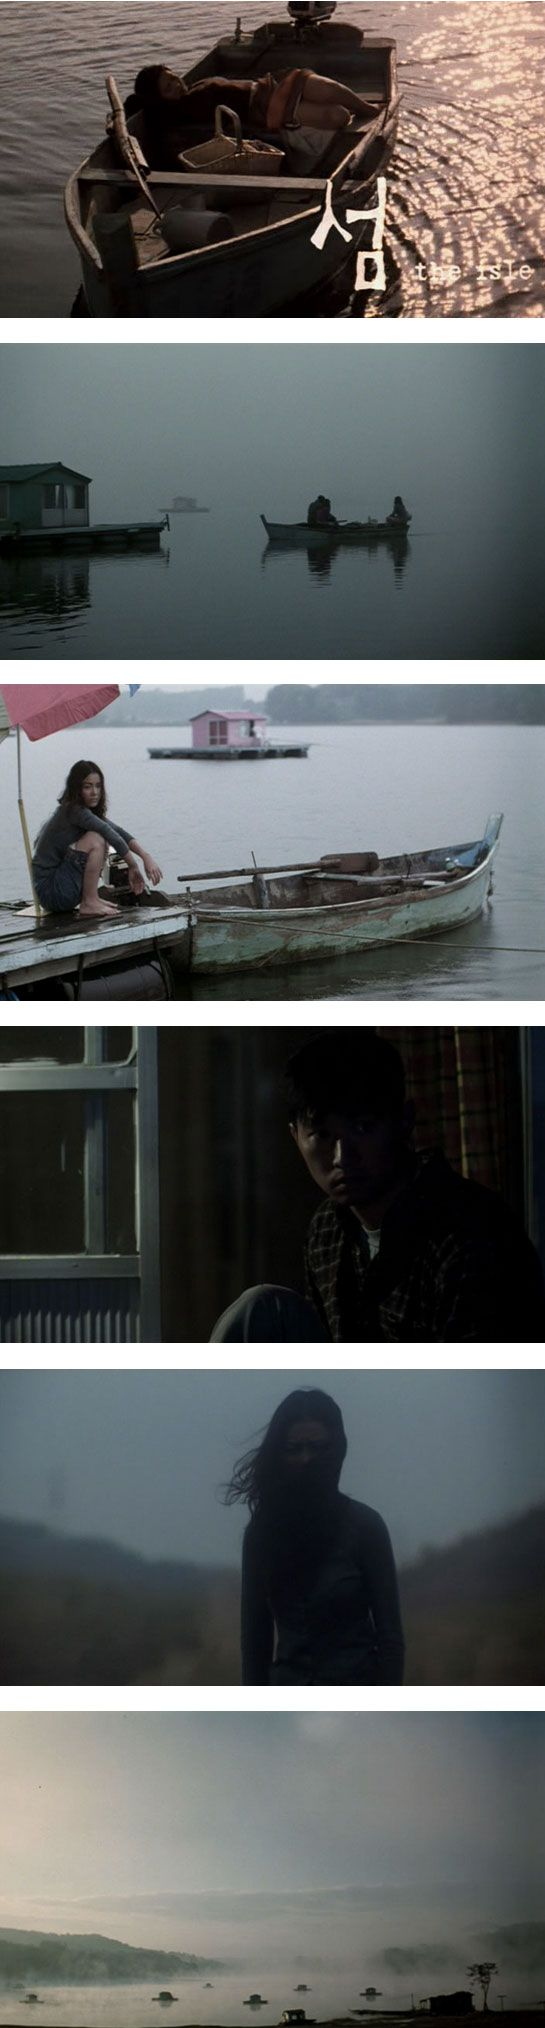 The Isle. 2000, Hwang Seo-sik, I, Kim Ki-duk.